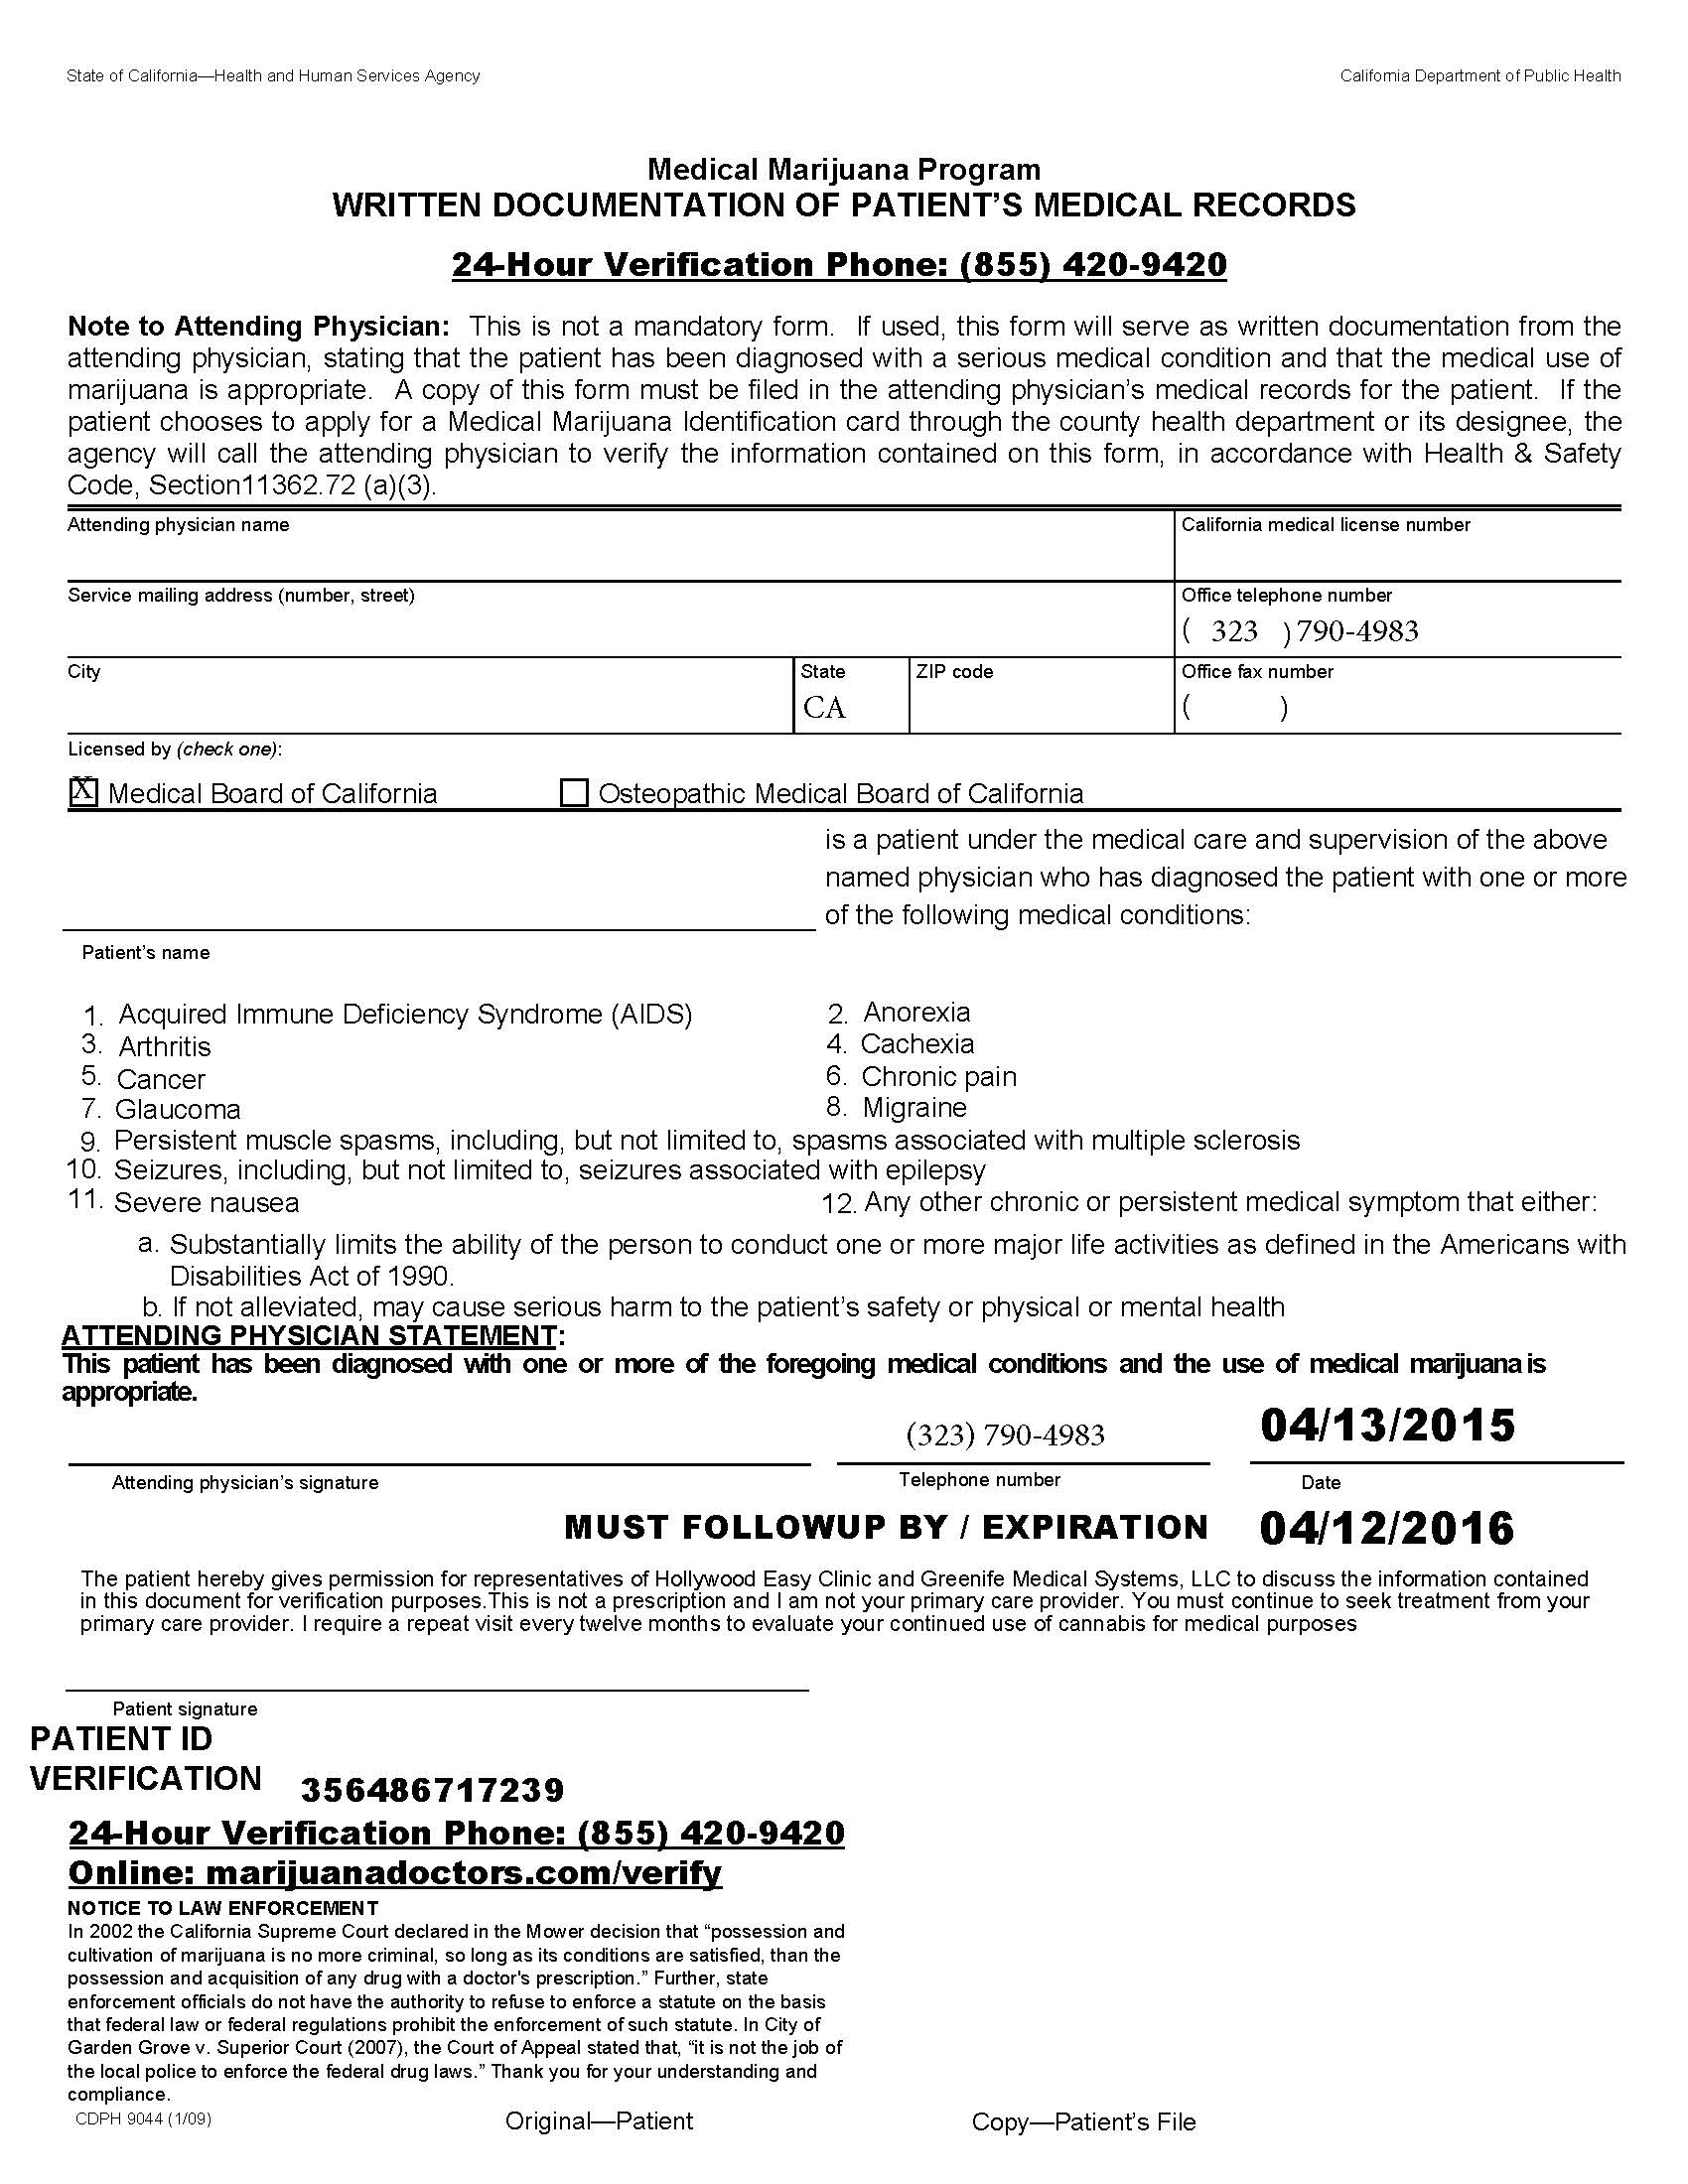 medical marijuana card application new york